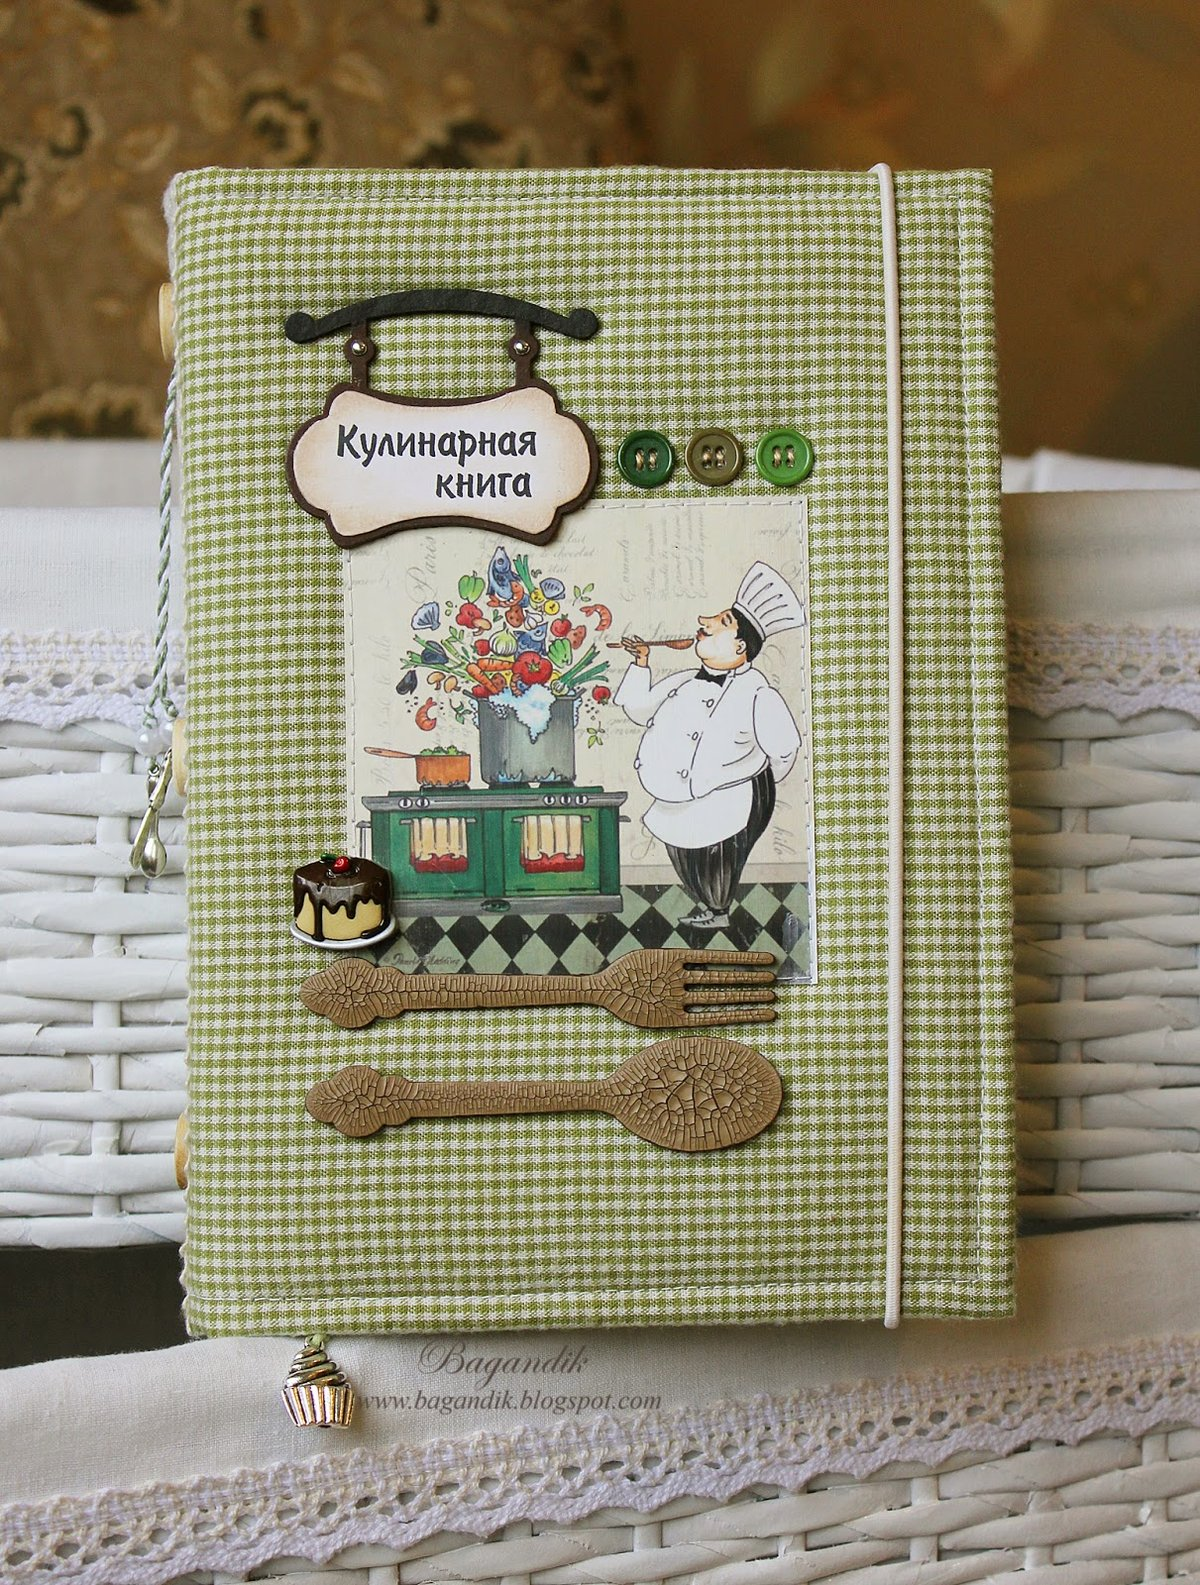 Кулинарная книга своими руками картинки